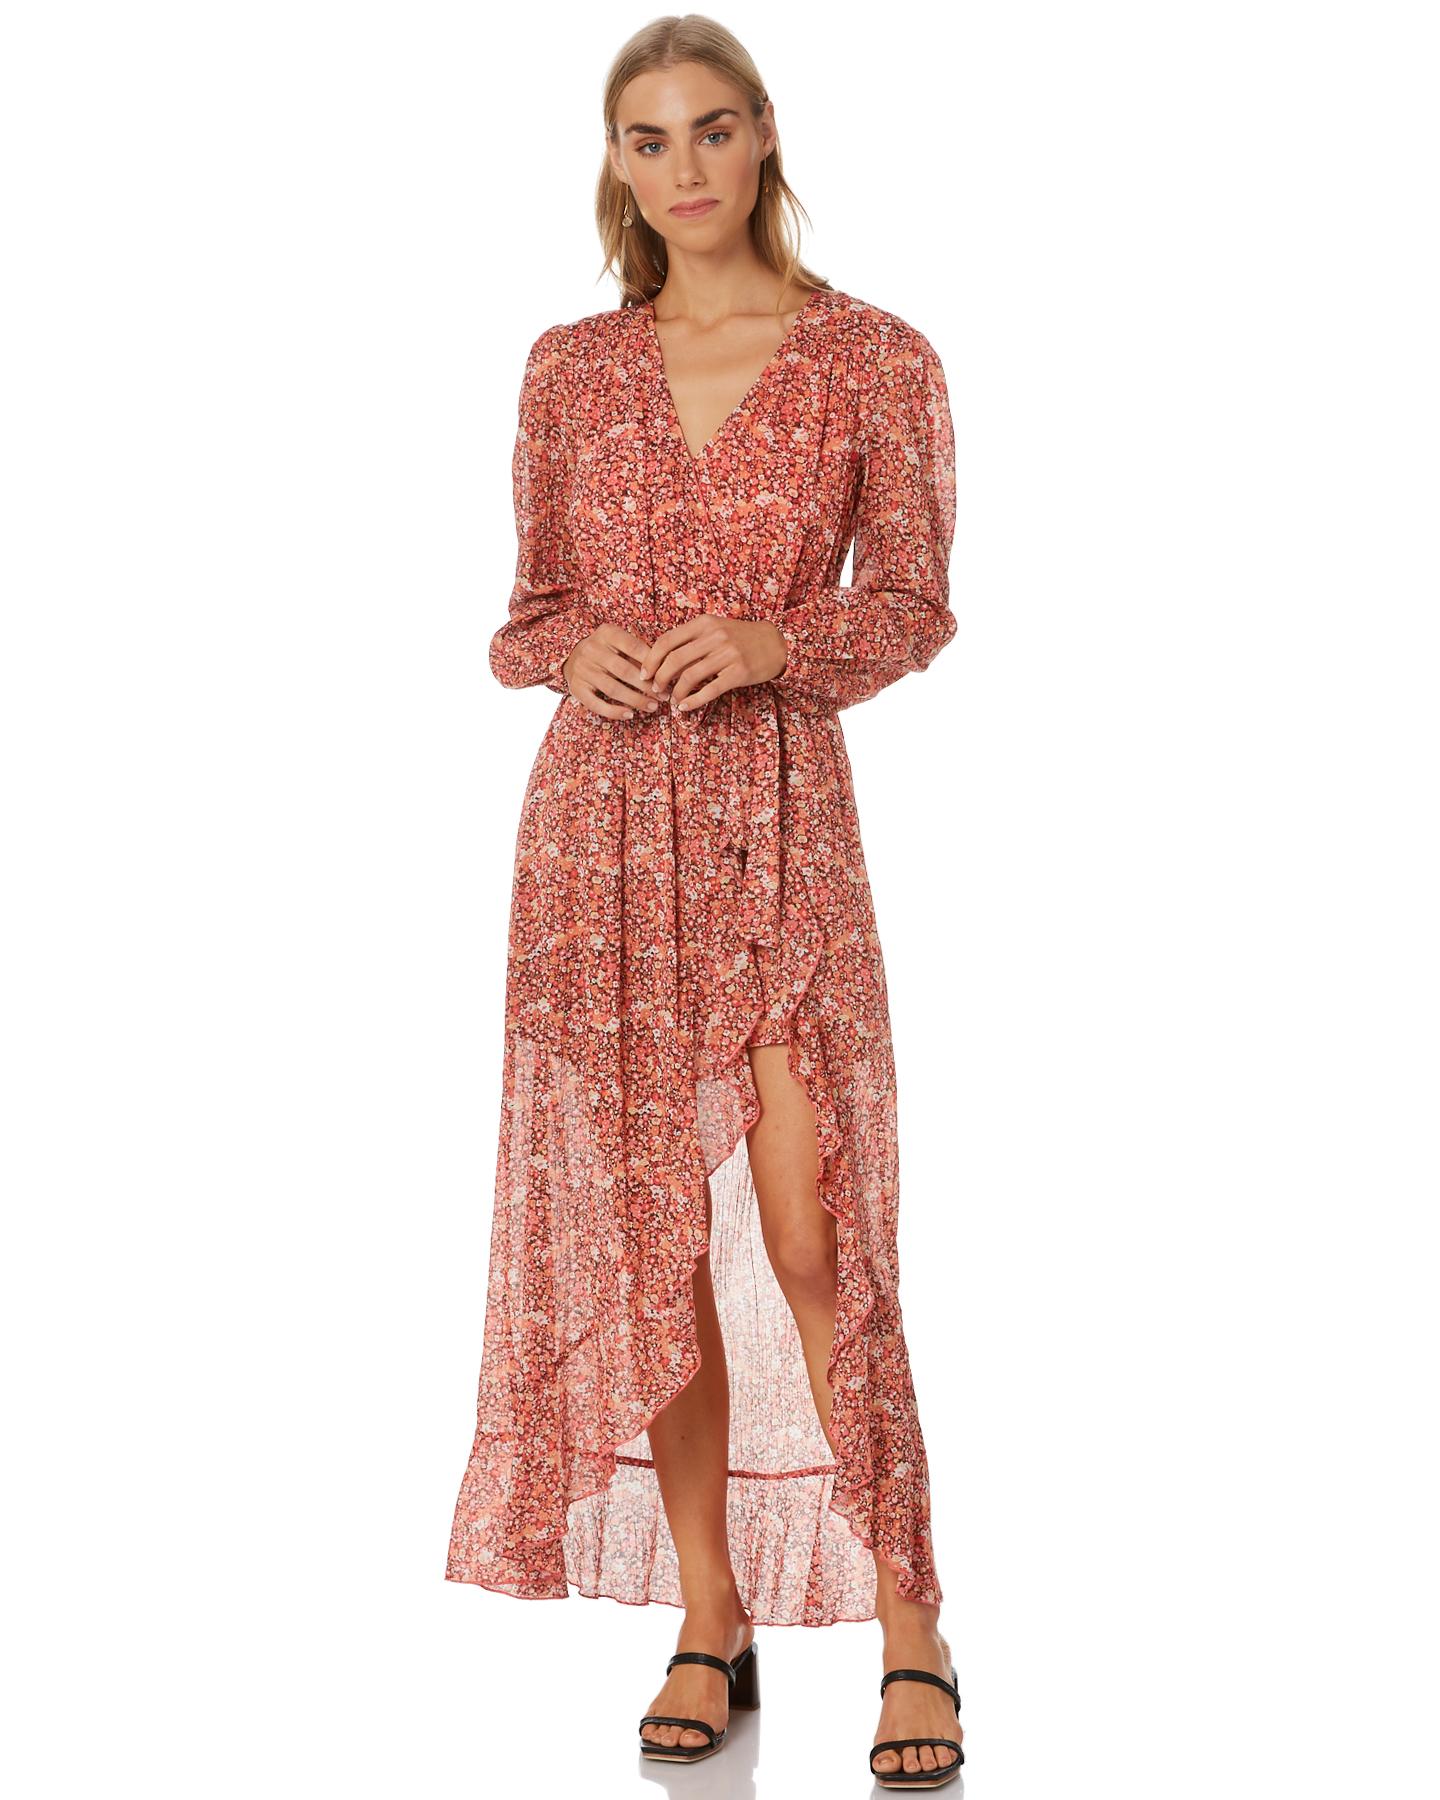 Minkpink Heirloom Blossom Maxi Dress